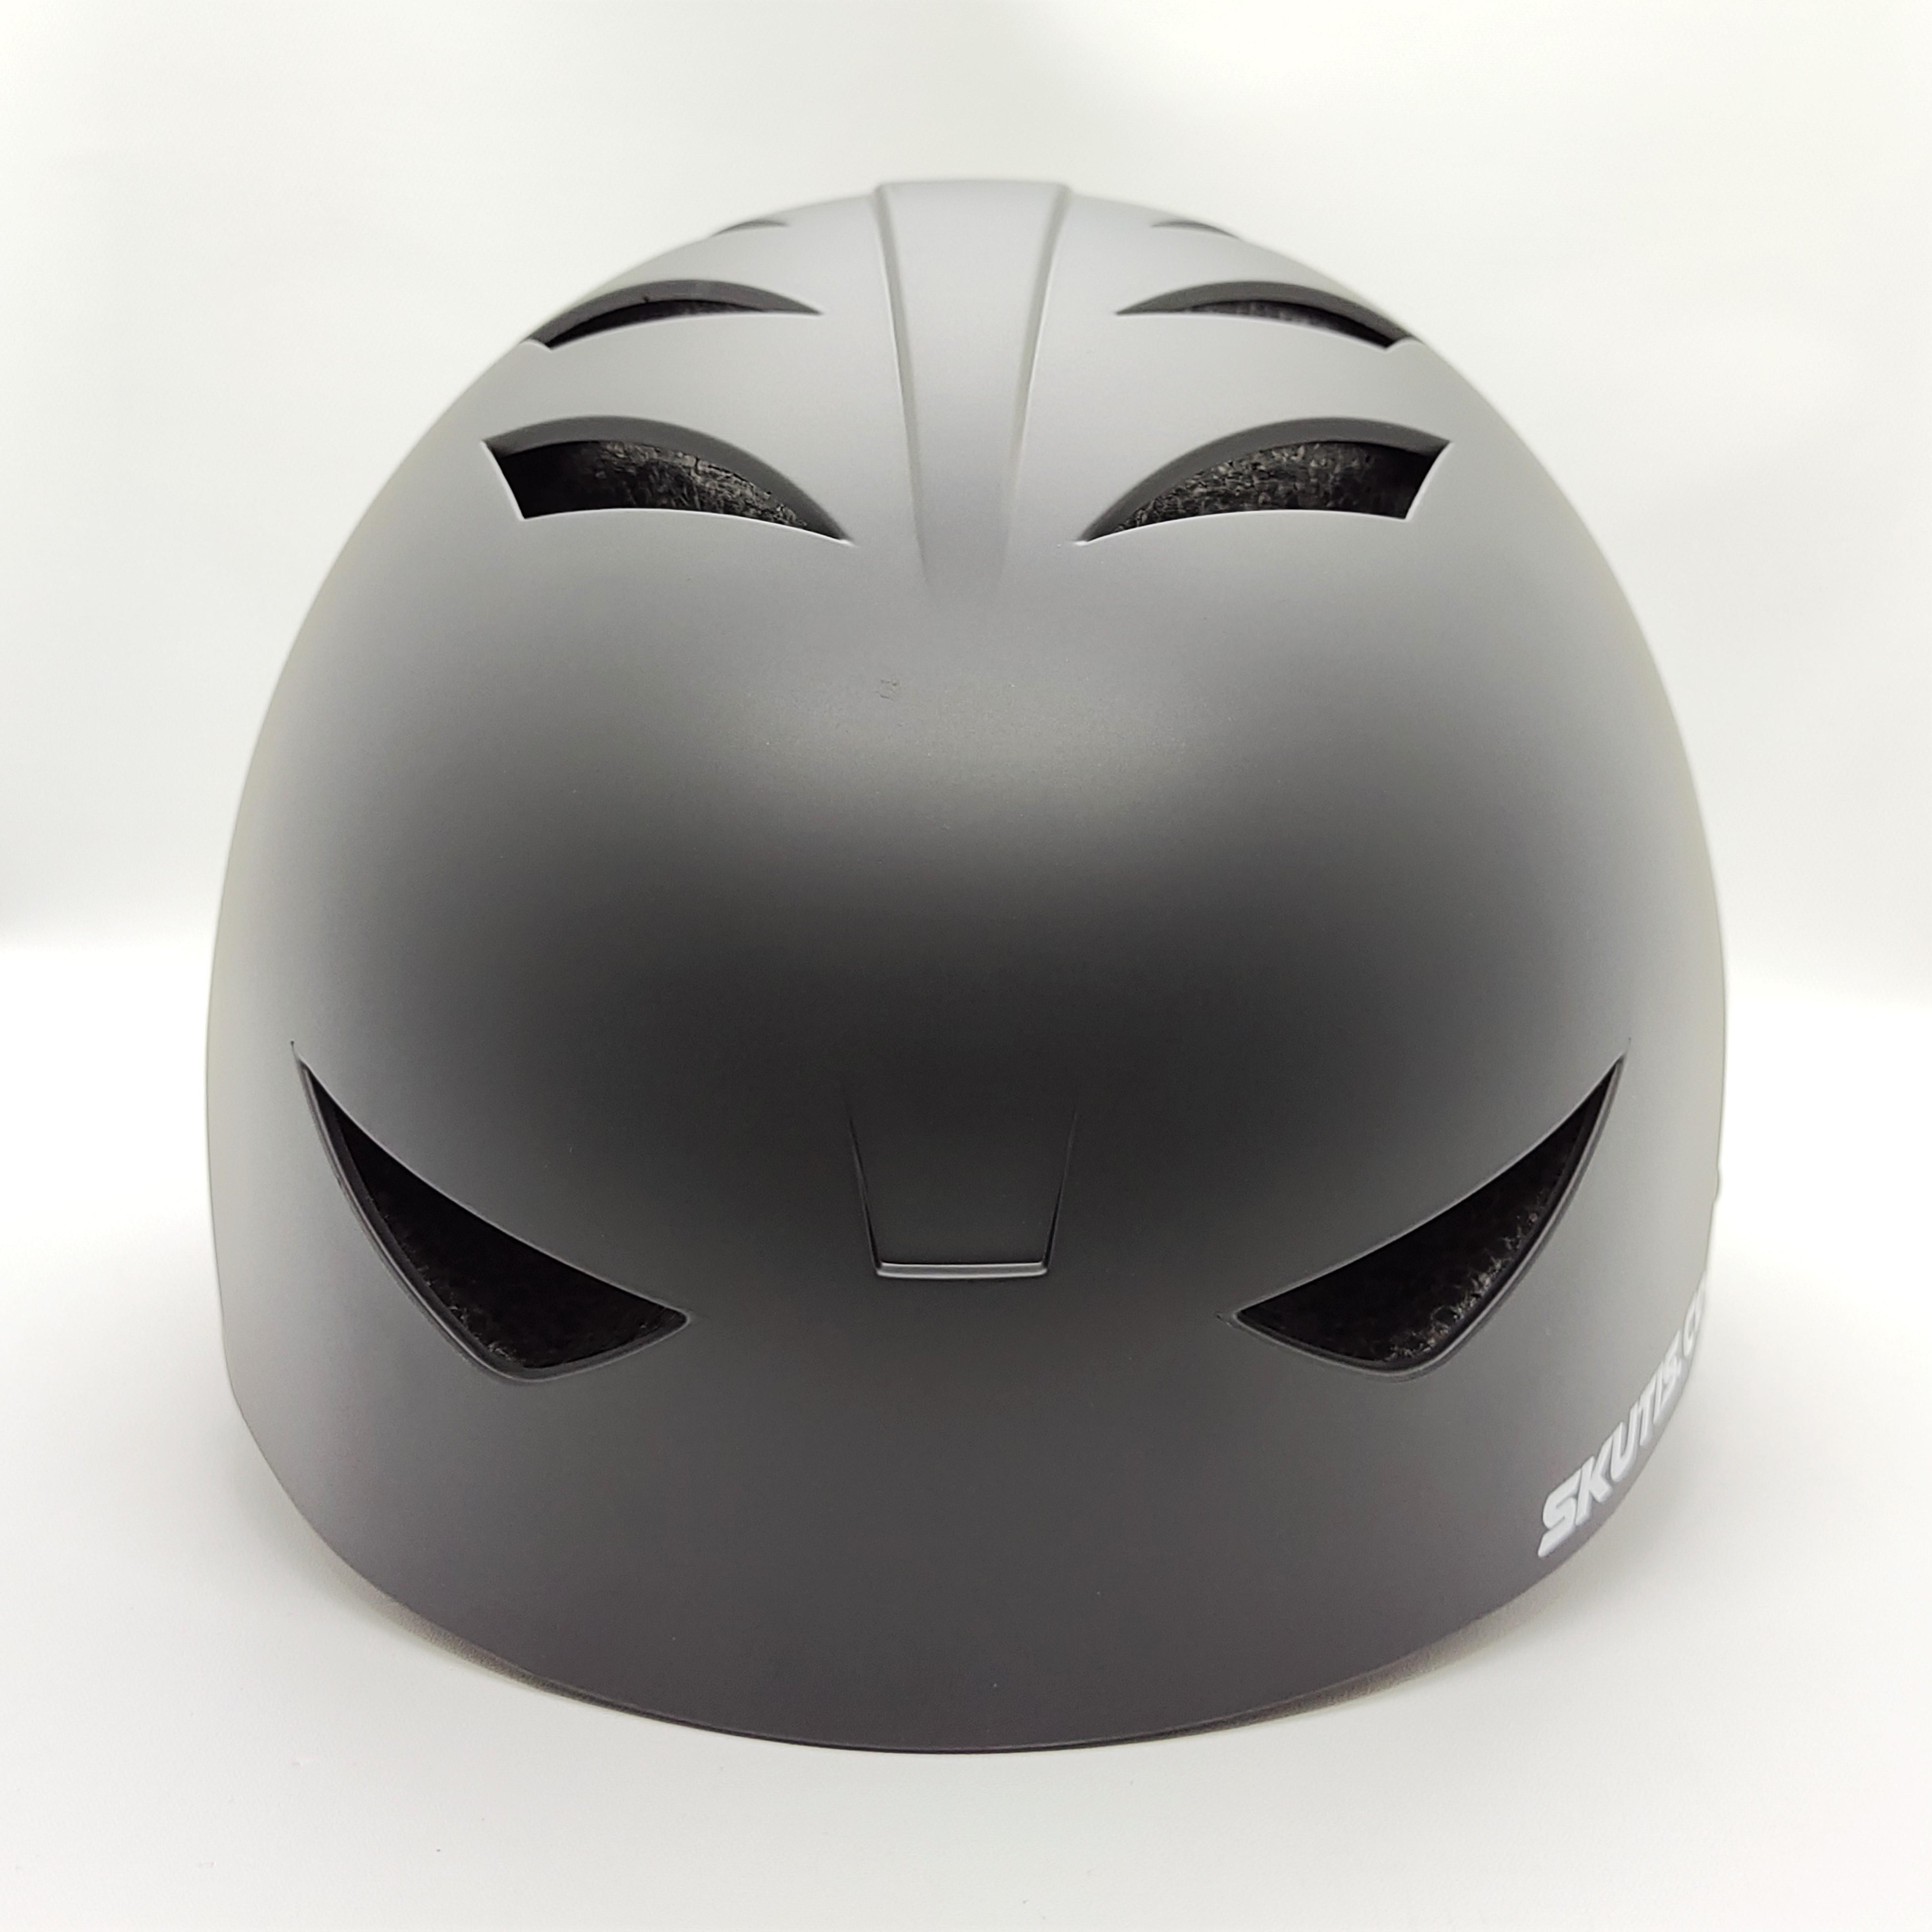 IMG 20200511 115943 - Skutis Gear Helmet